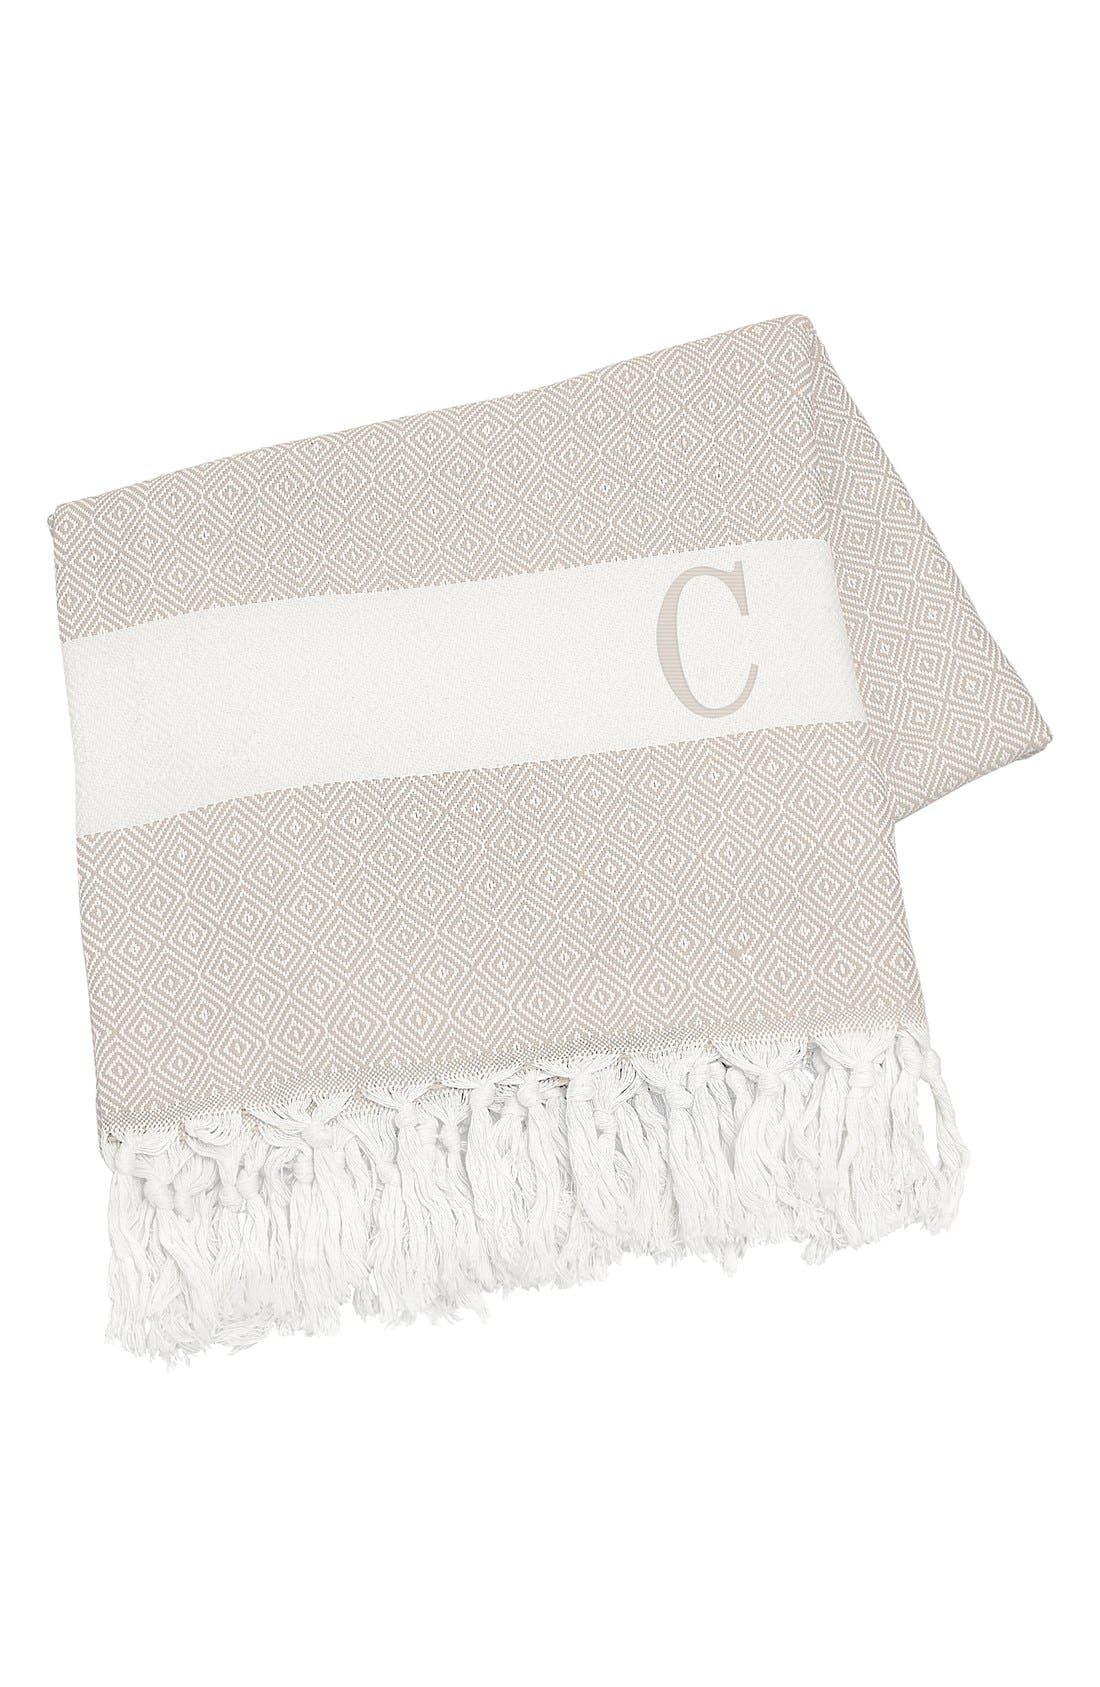 Monogram Turkish Cotton Throw,                         Main,                         color,